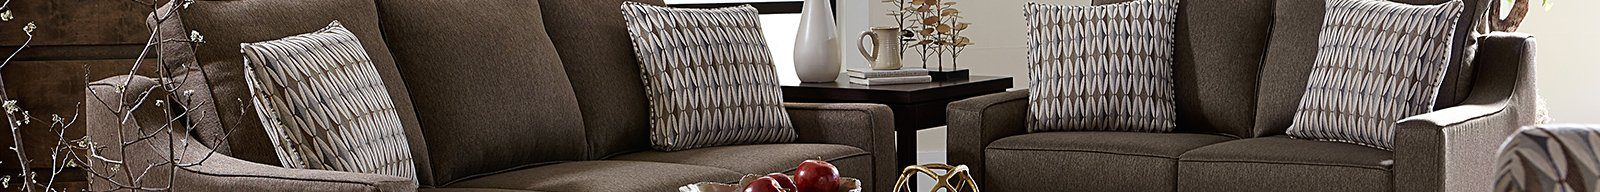 brown furniture header